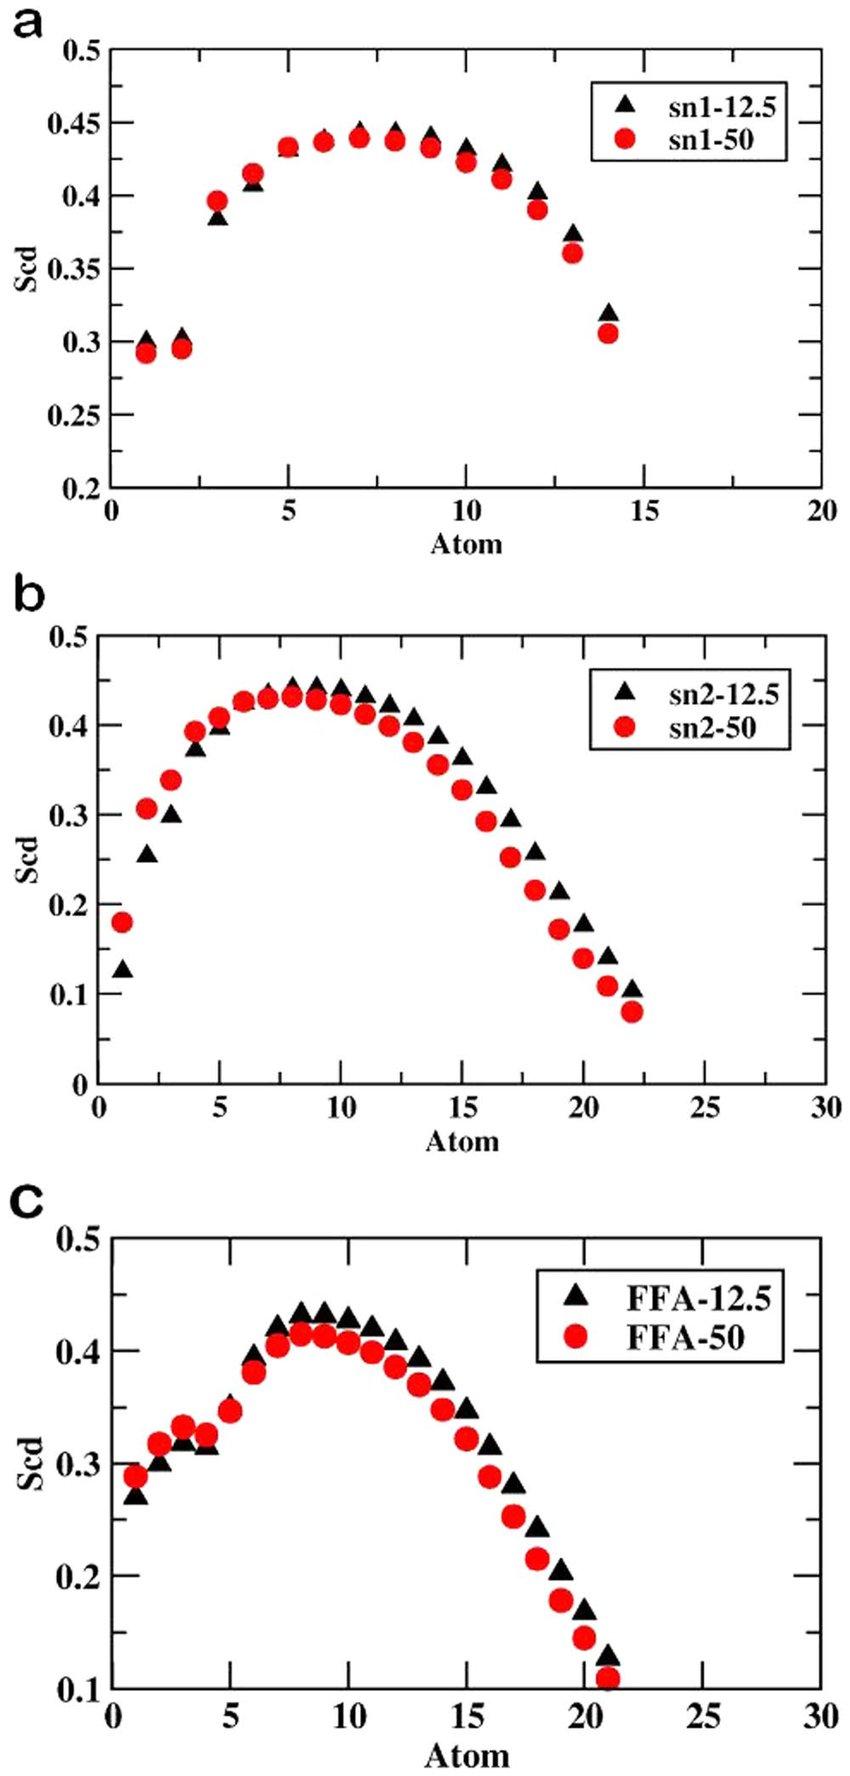 medium resolution of values of order parameter s cd along the a sn1 of memb 12 5